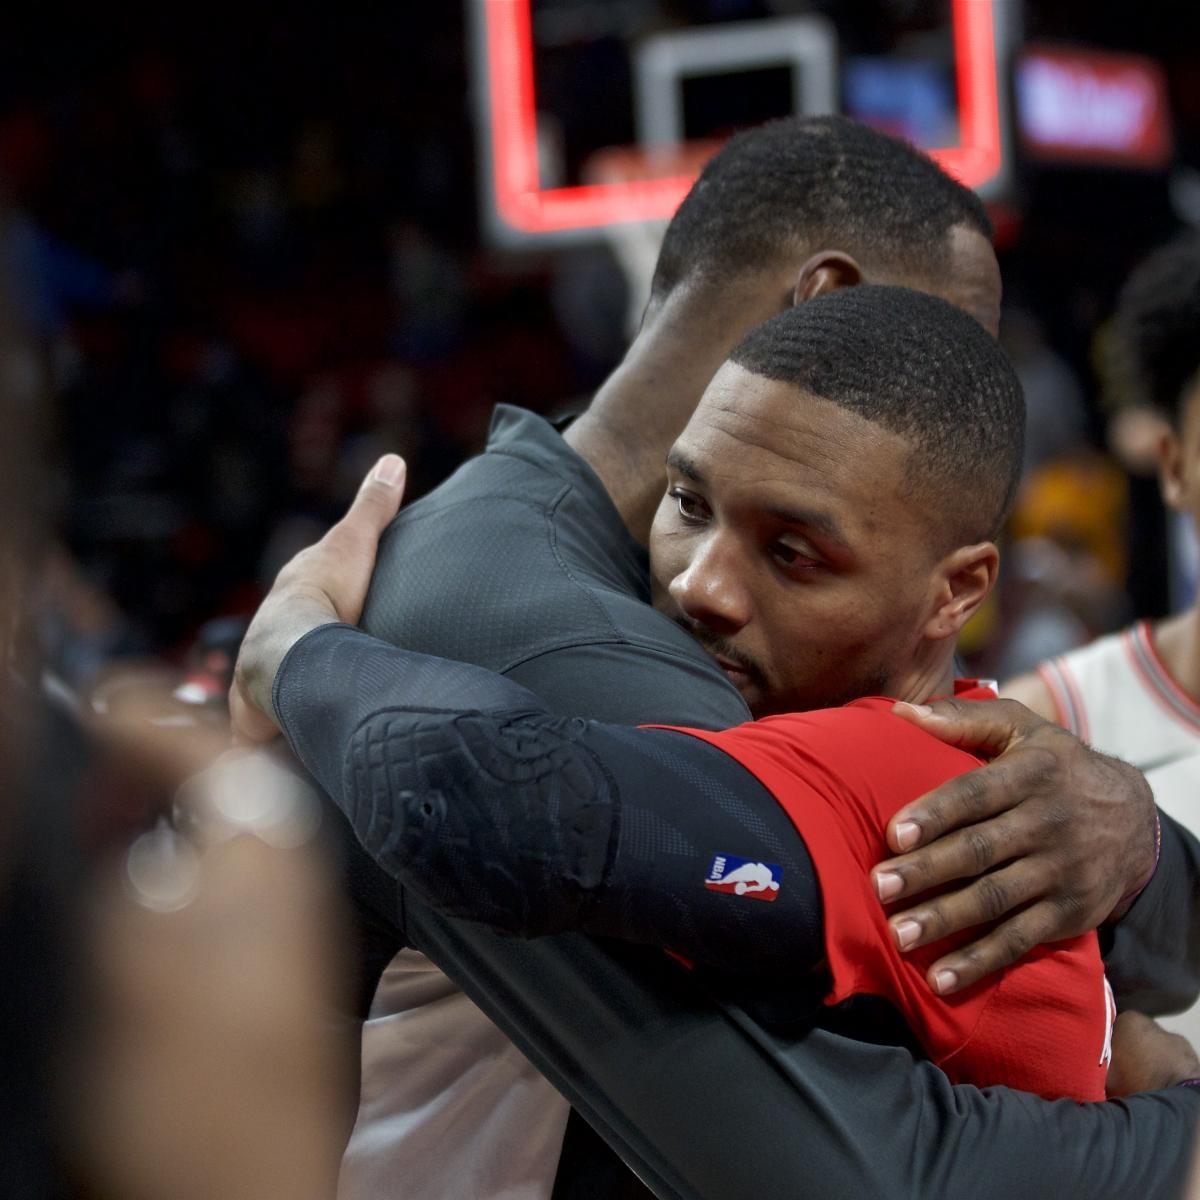 Damian Lillard Picks Lakers' LeBron James for NBA MVP After 'Dominant' Season